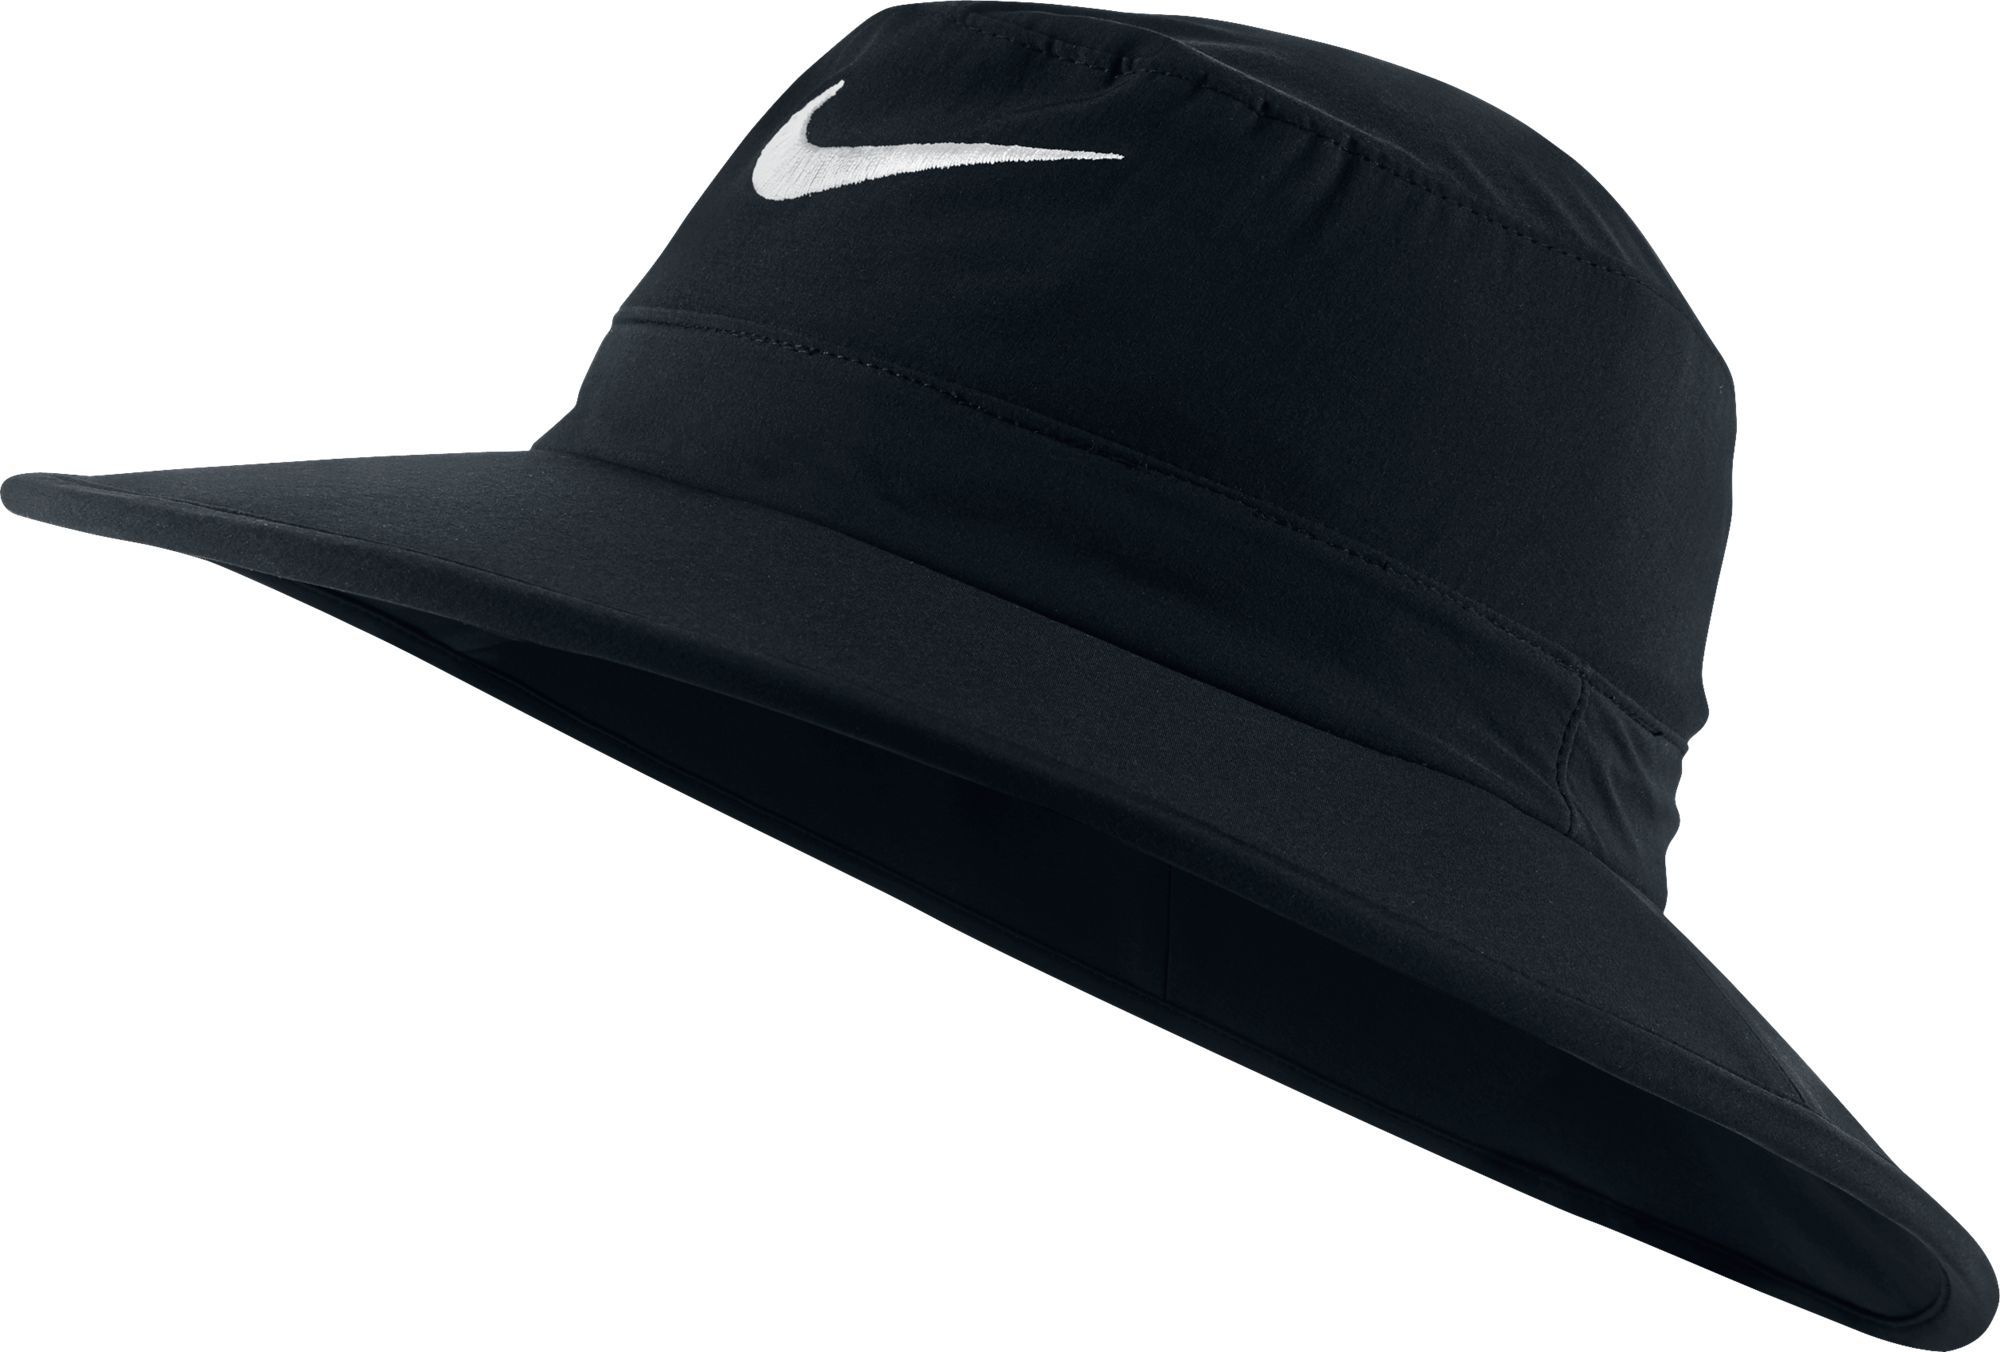 414d7a080d4 Nike Sun Protect Bucket Hat